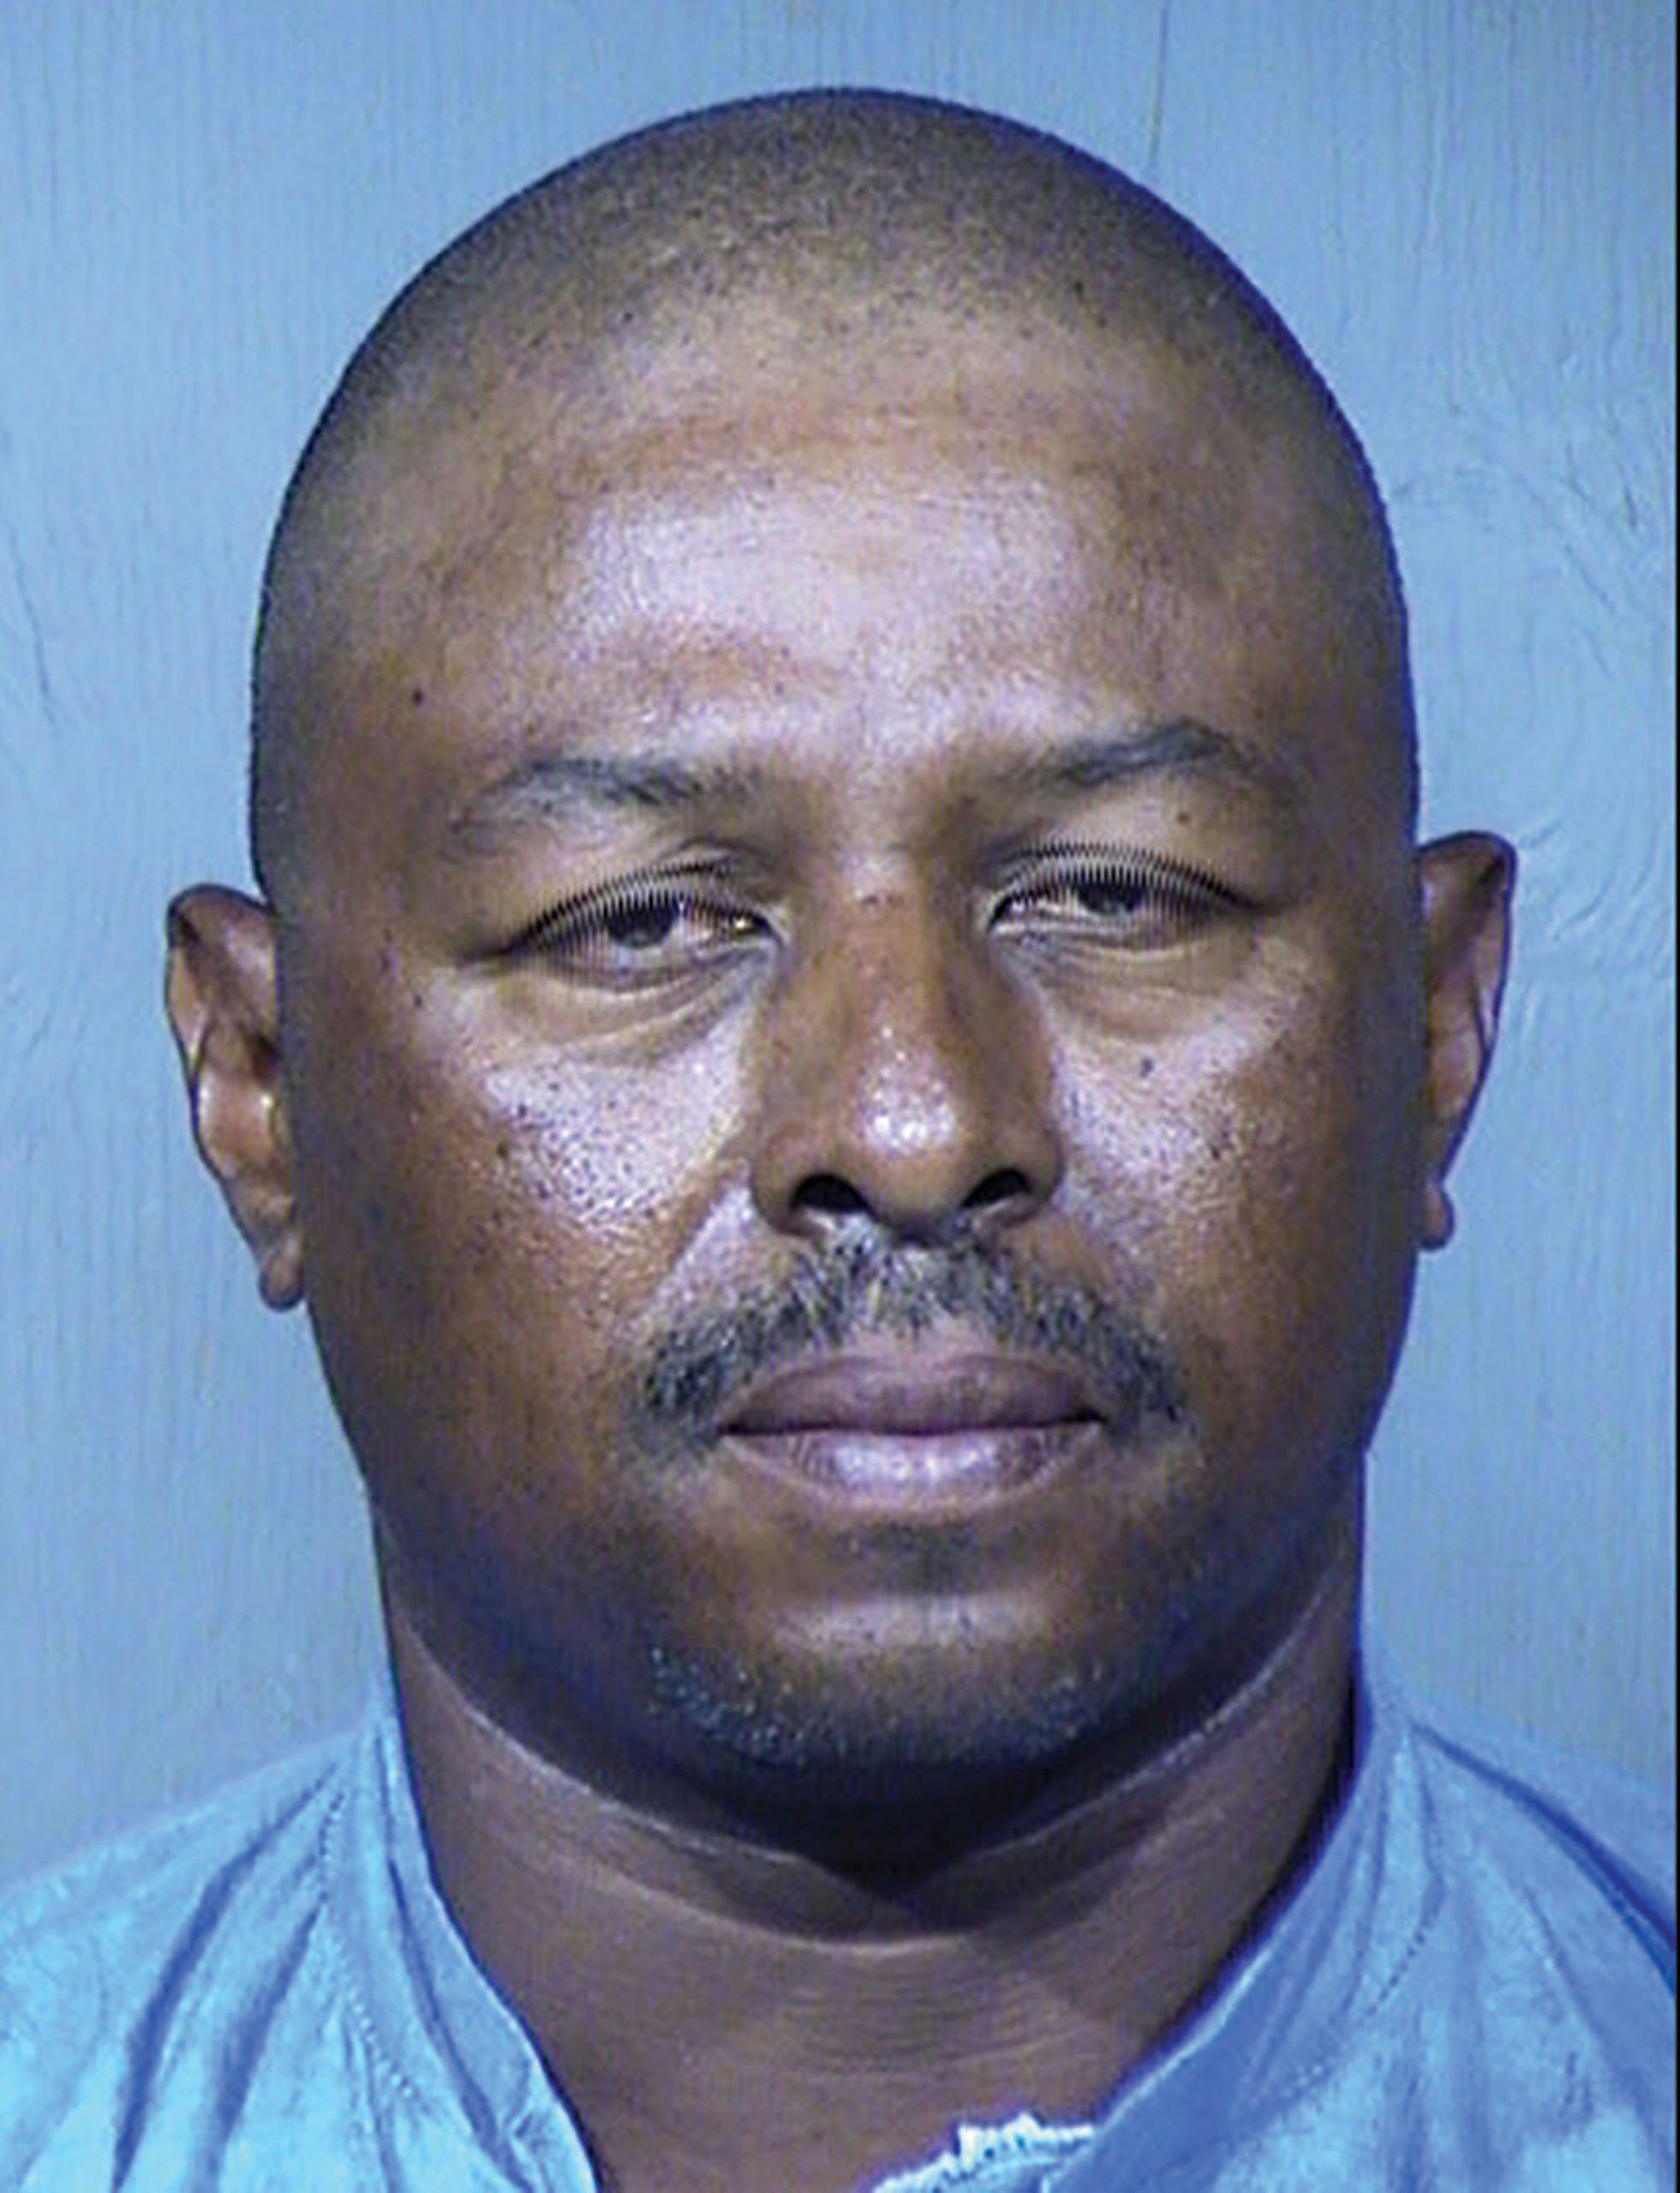 Javan Berry's booking photo; Photo courtesy Maricopa County Sheriff's office